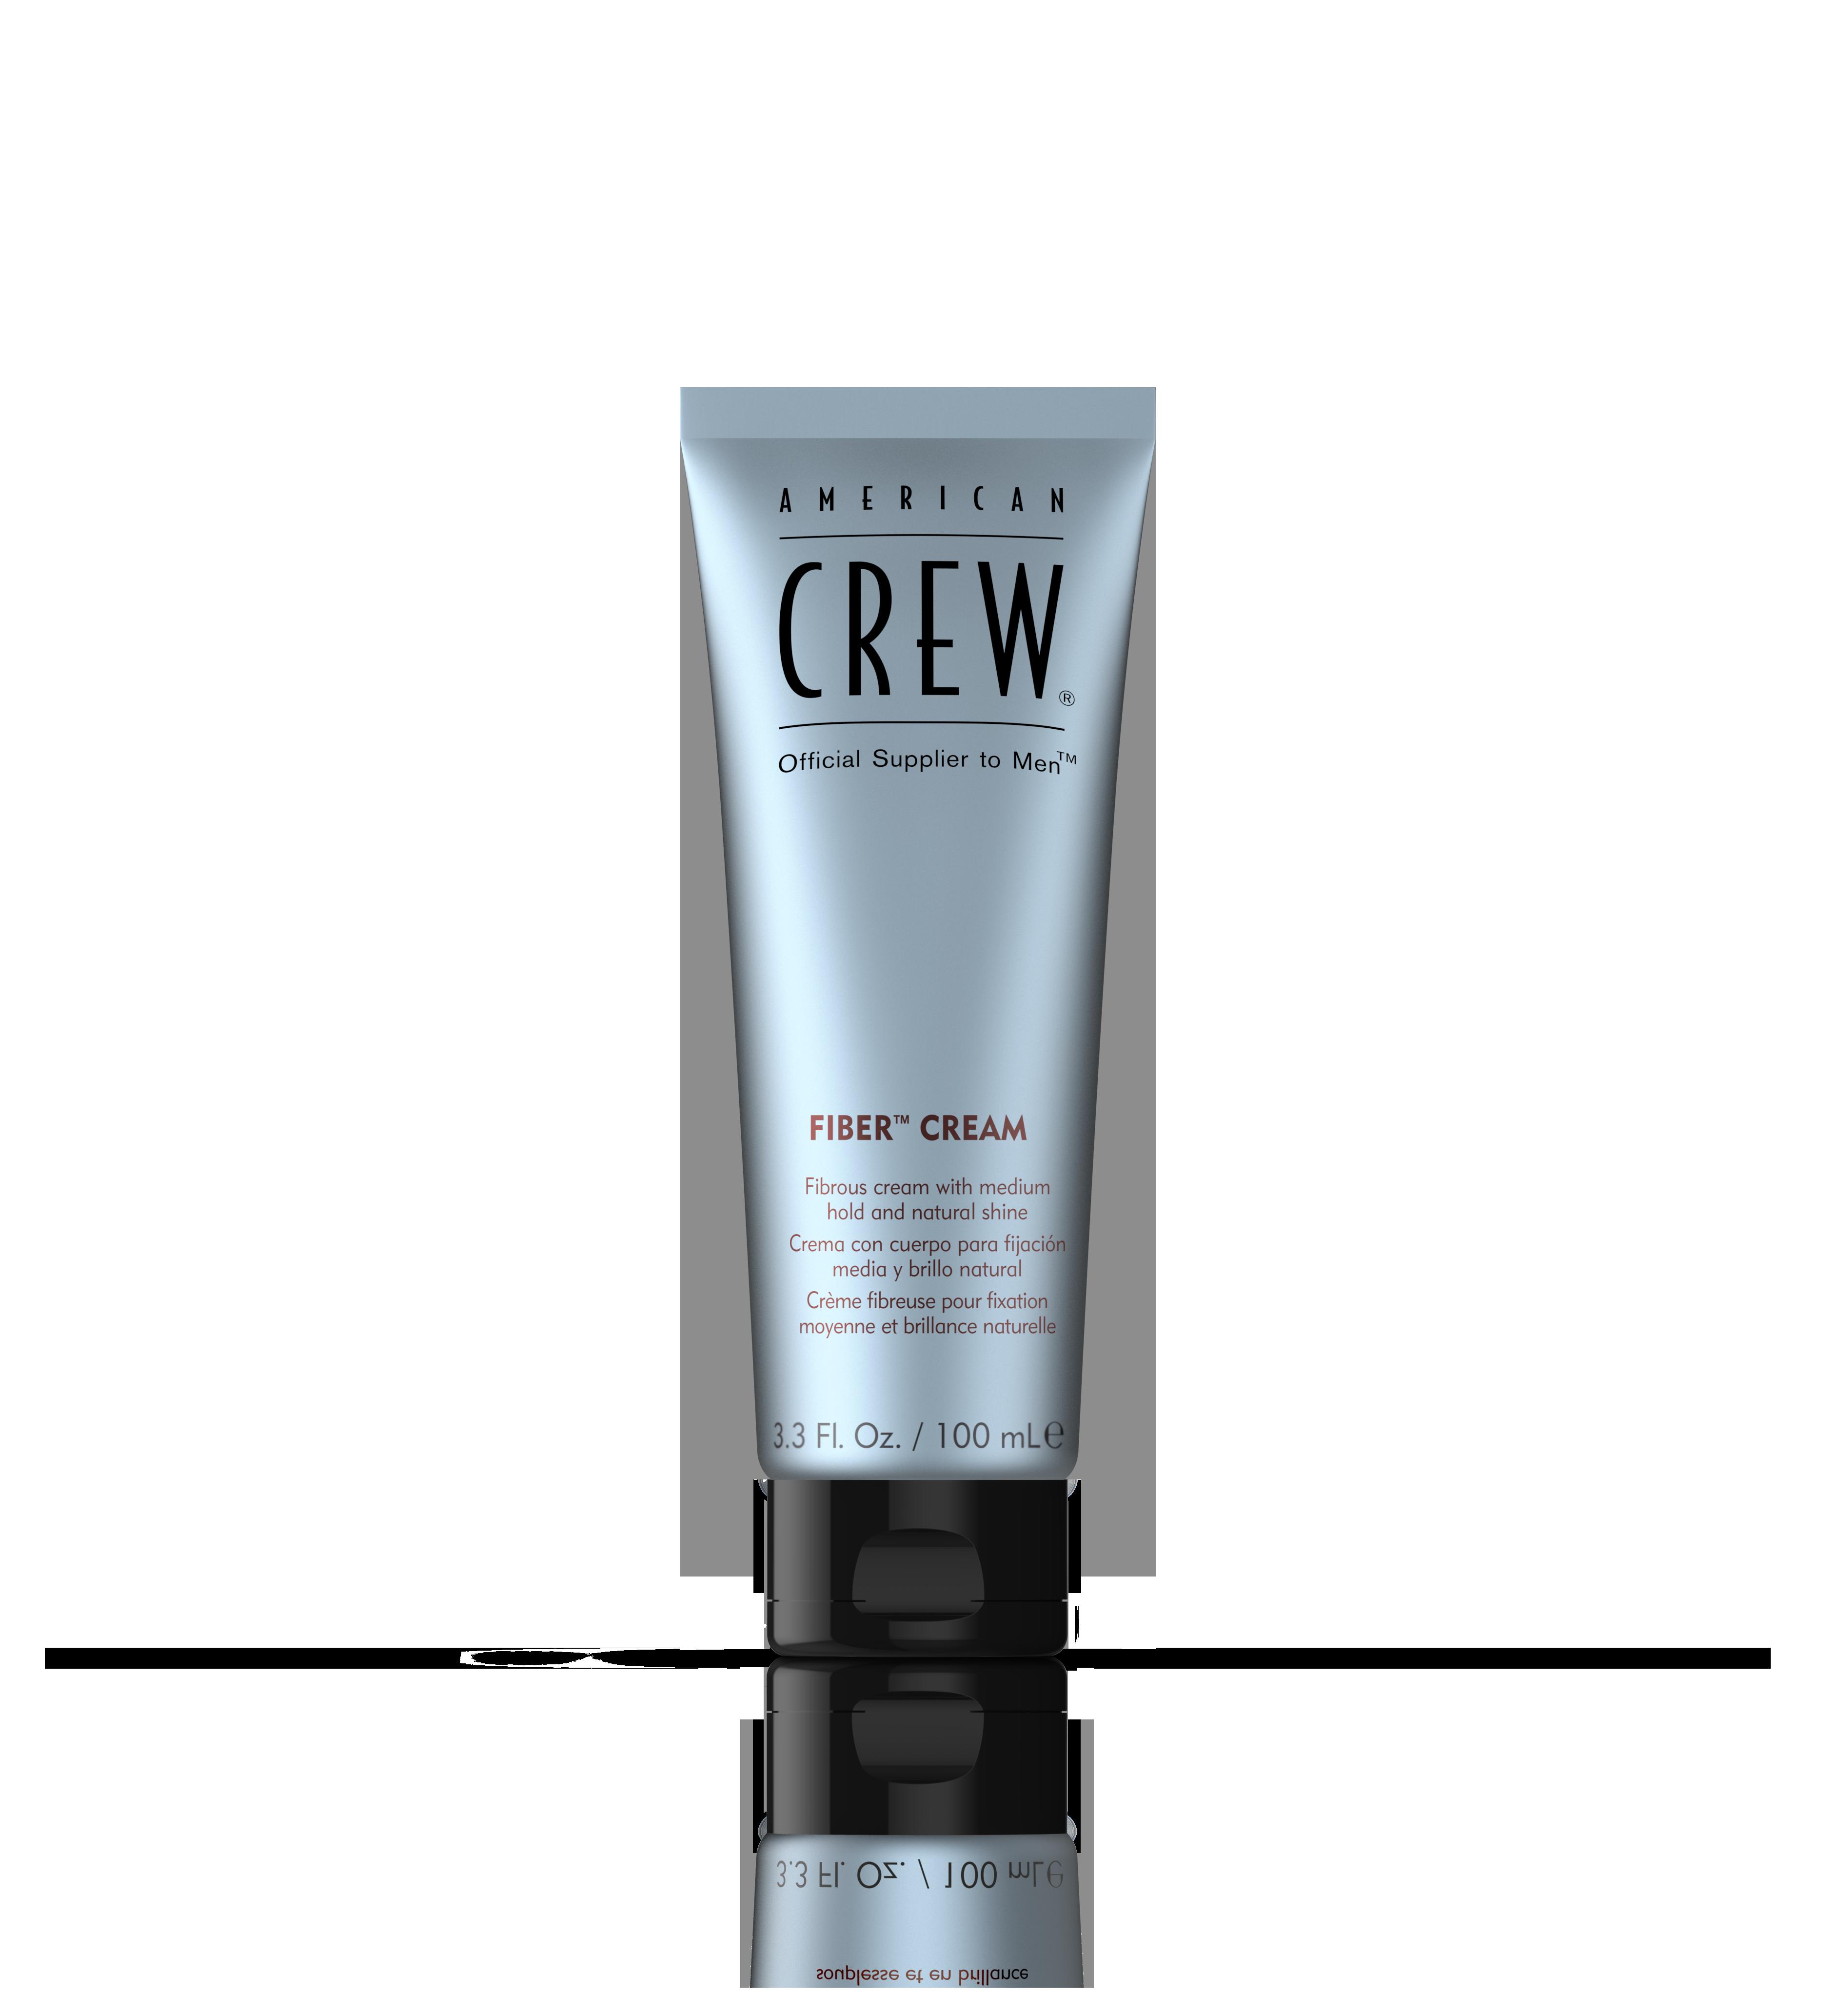 American Crew Fiber Cream Combines Flexibility and Control